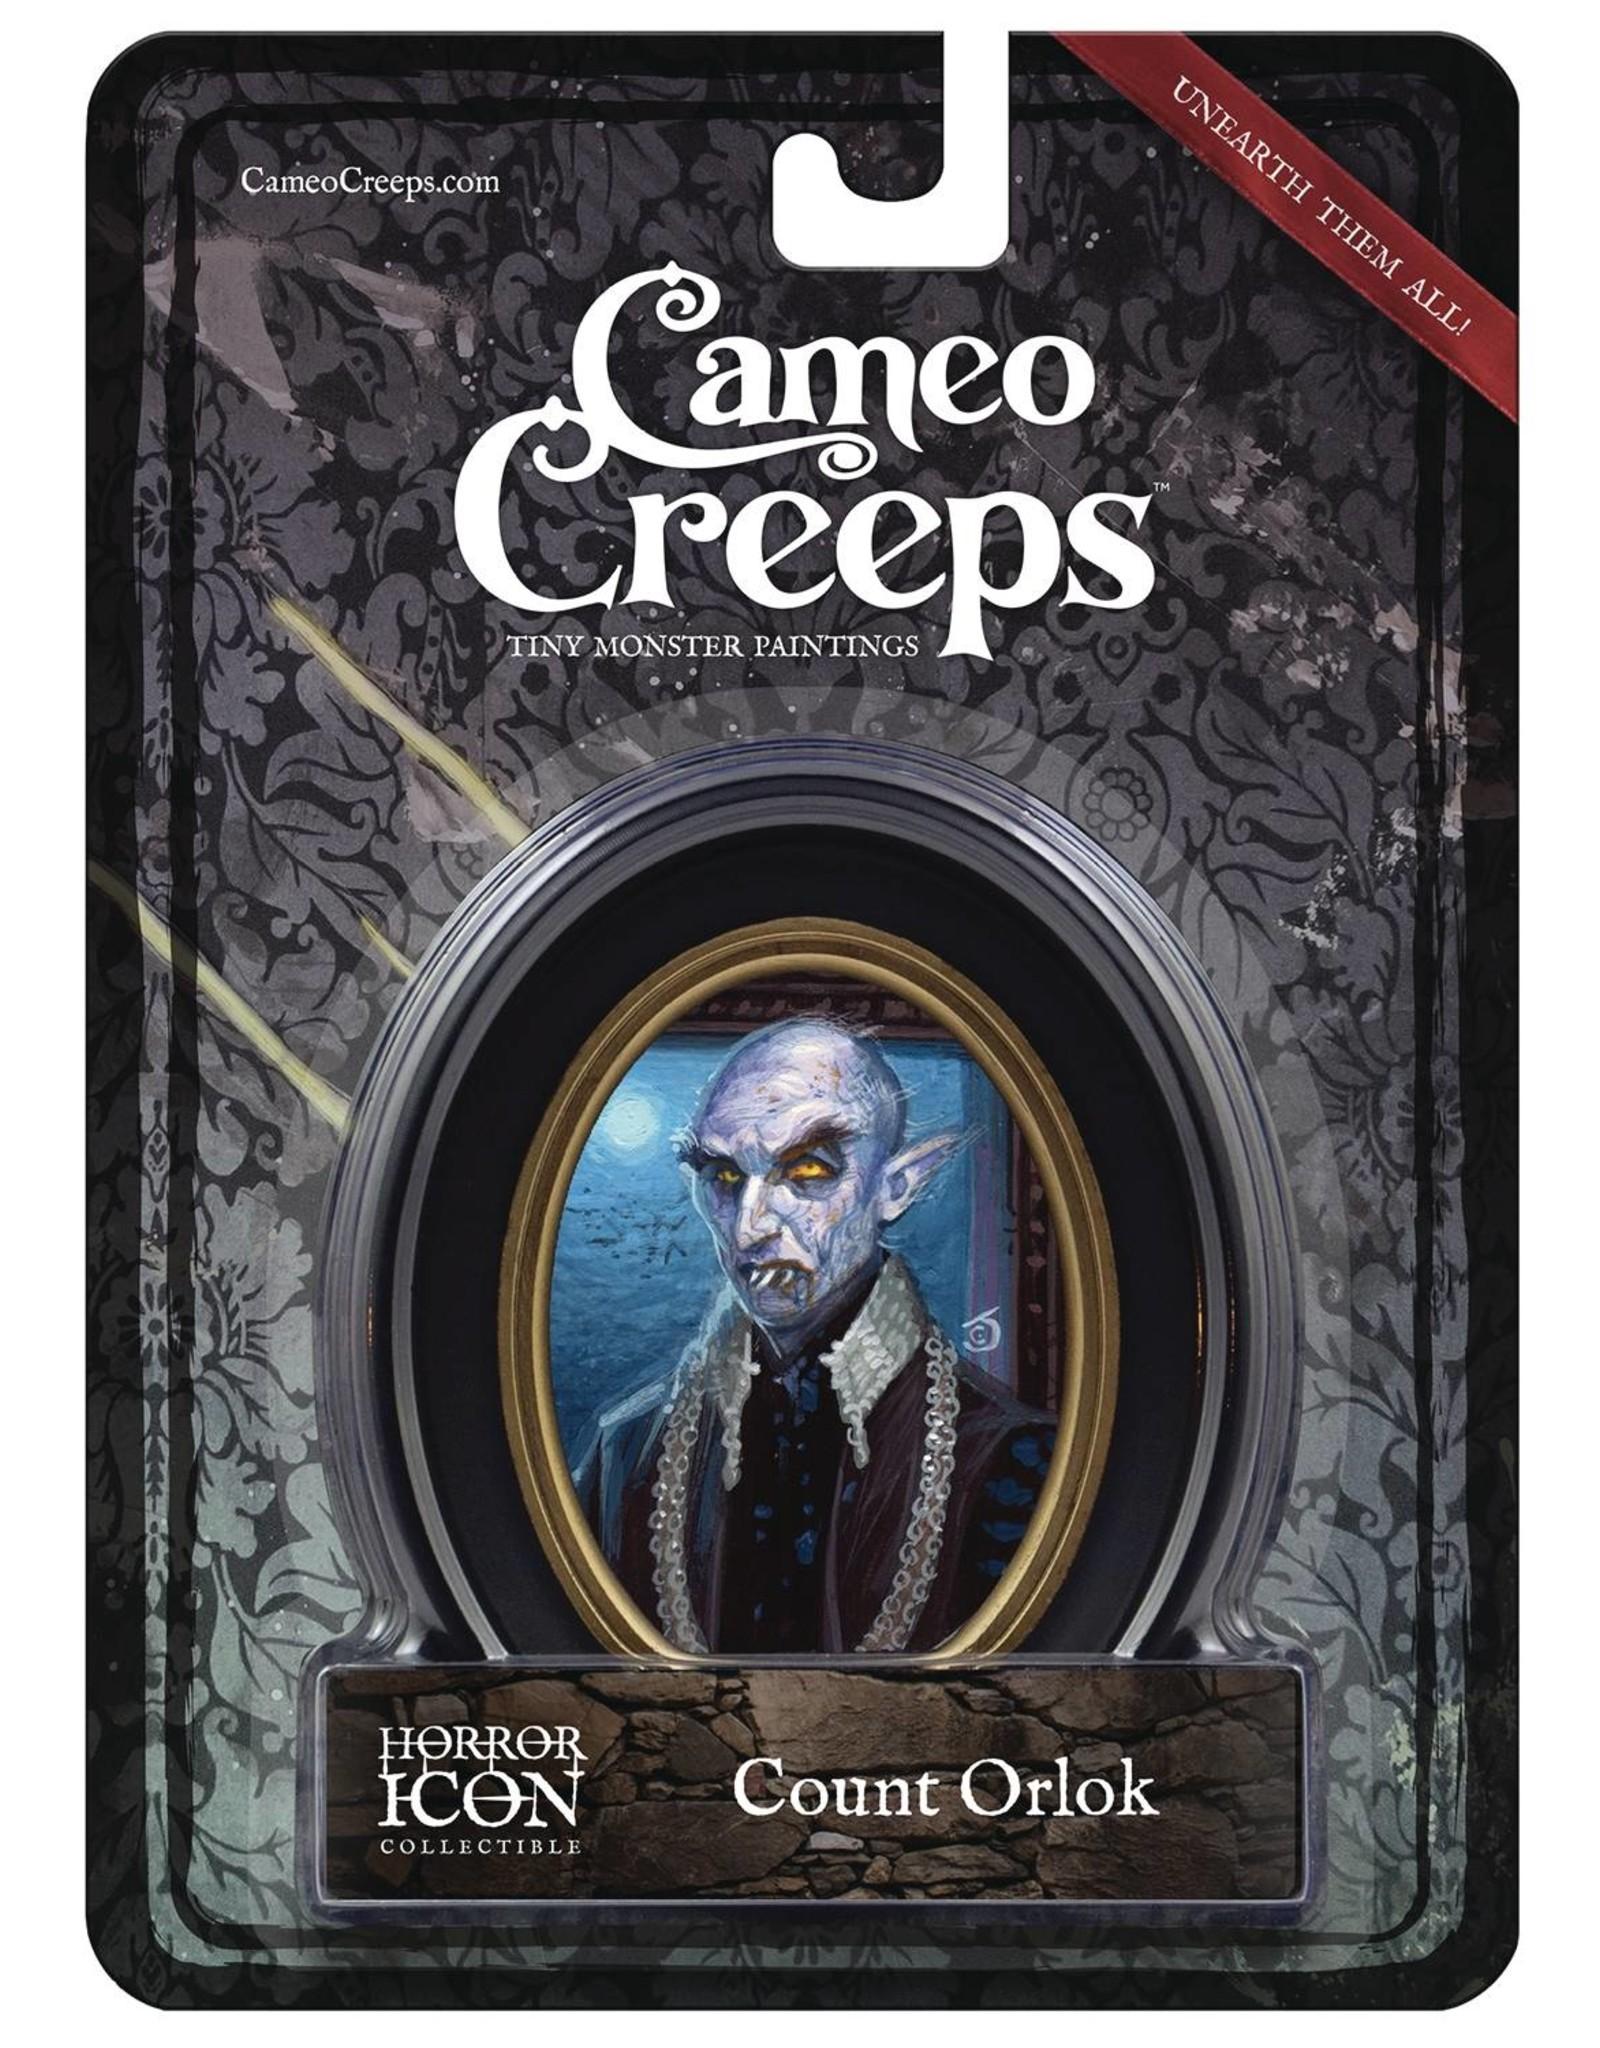 CAMEOCREEPS COUNT ORLOK MINI CAMEO PORTRAIT